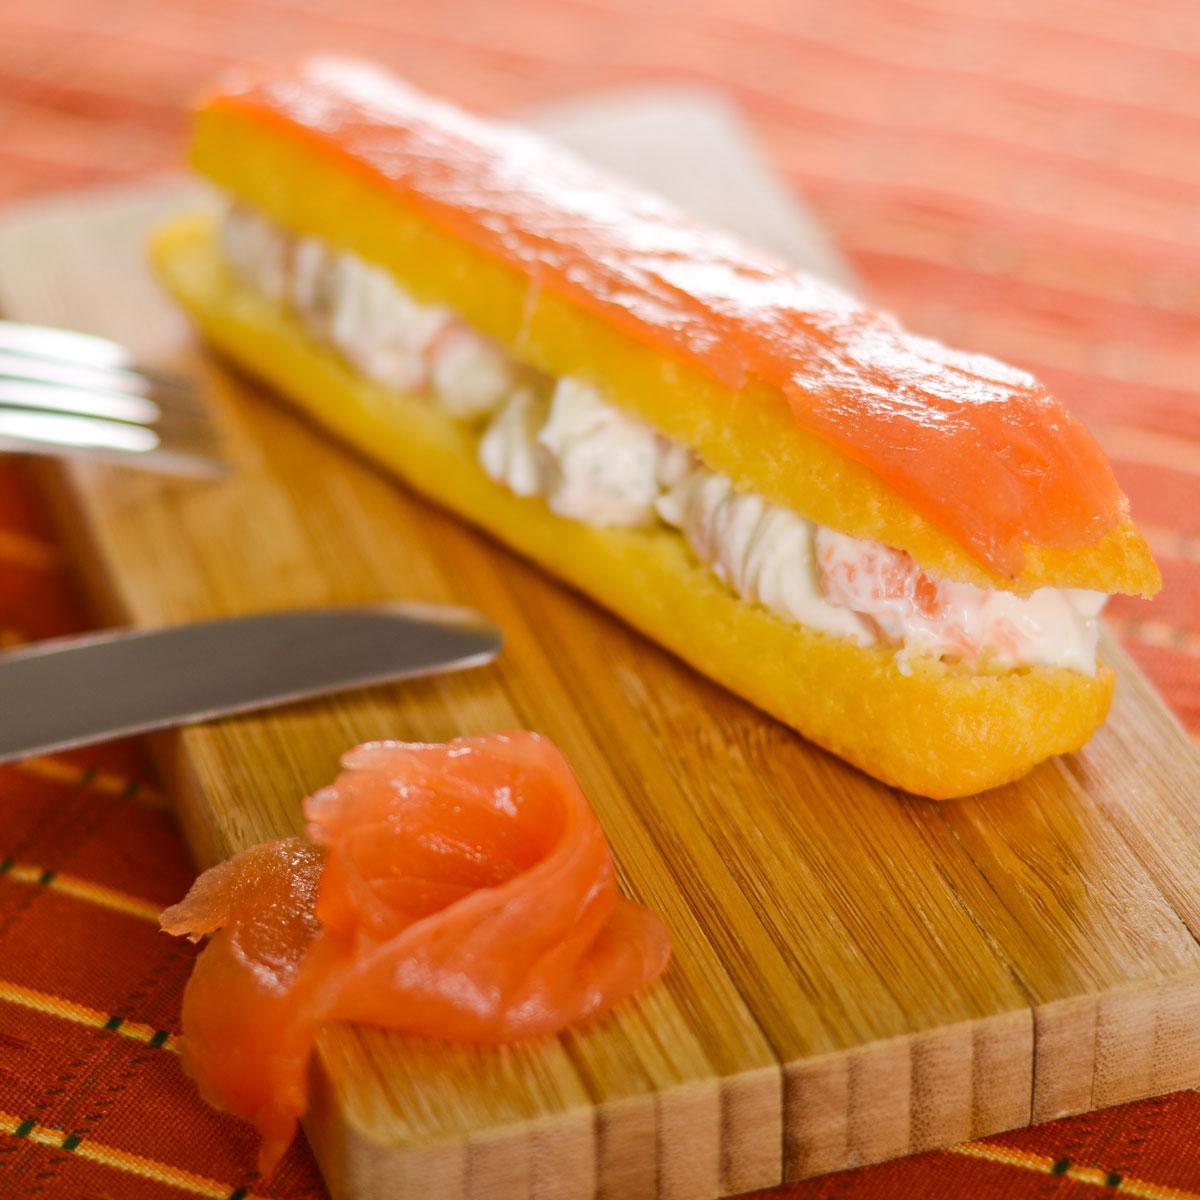 Recette clair au saumon fum cuisine madame figaro - Prix du saumon ...